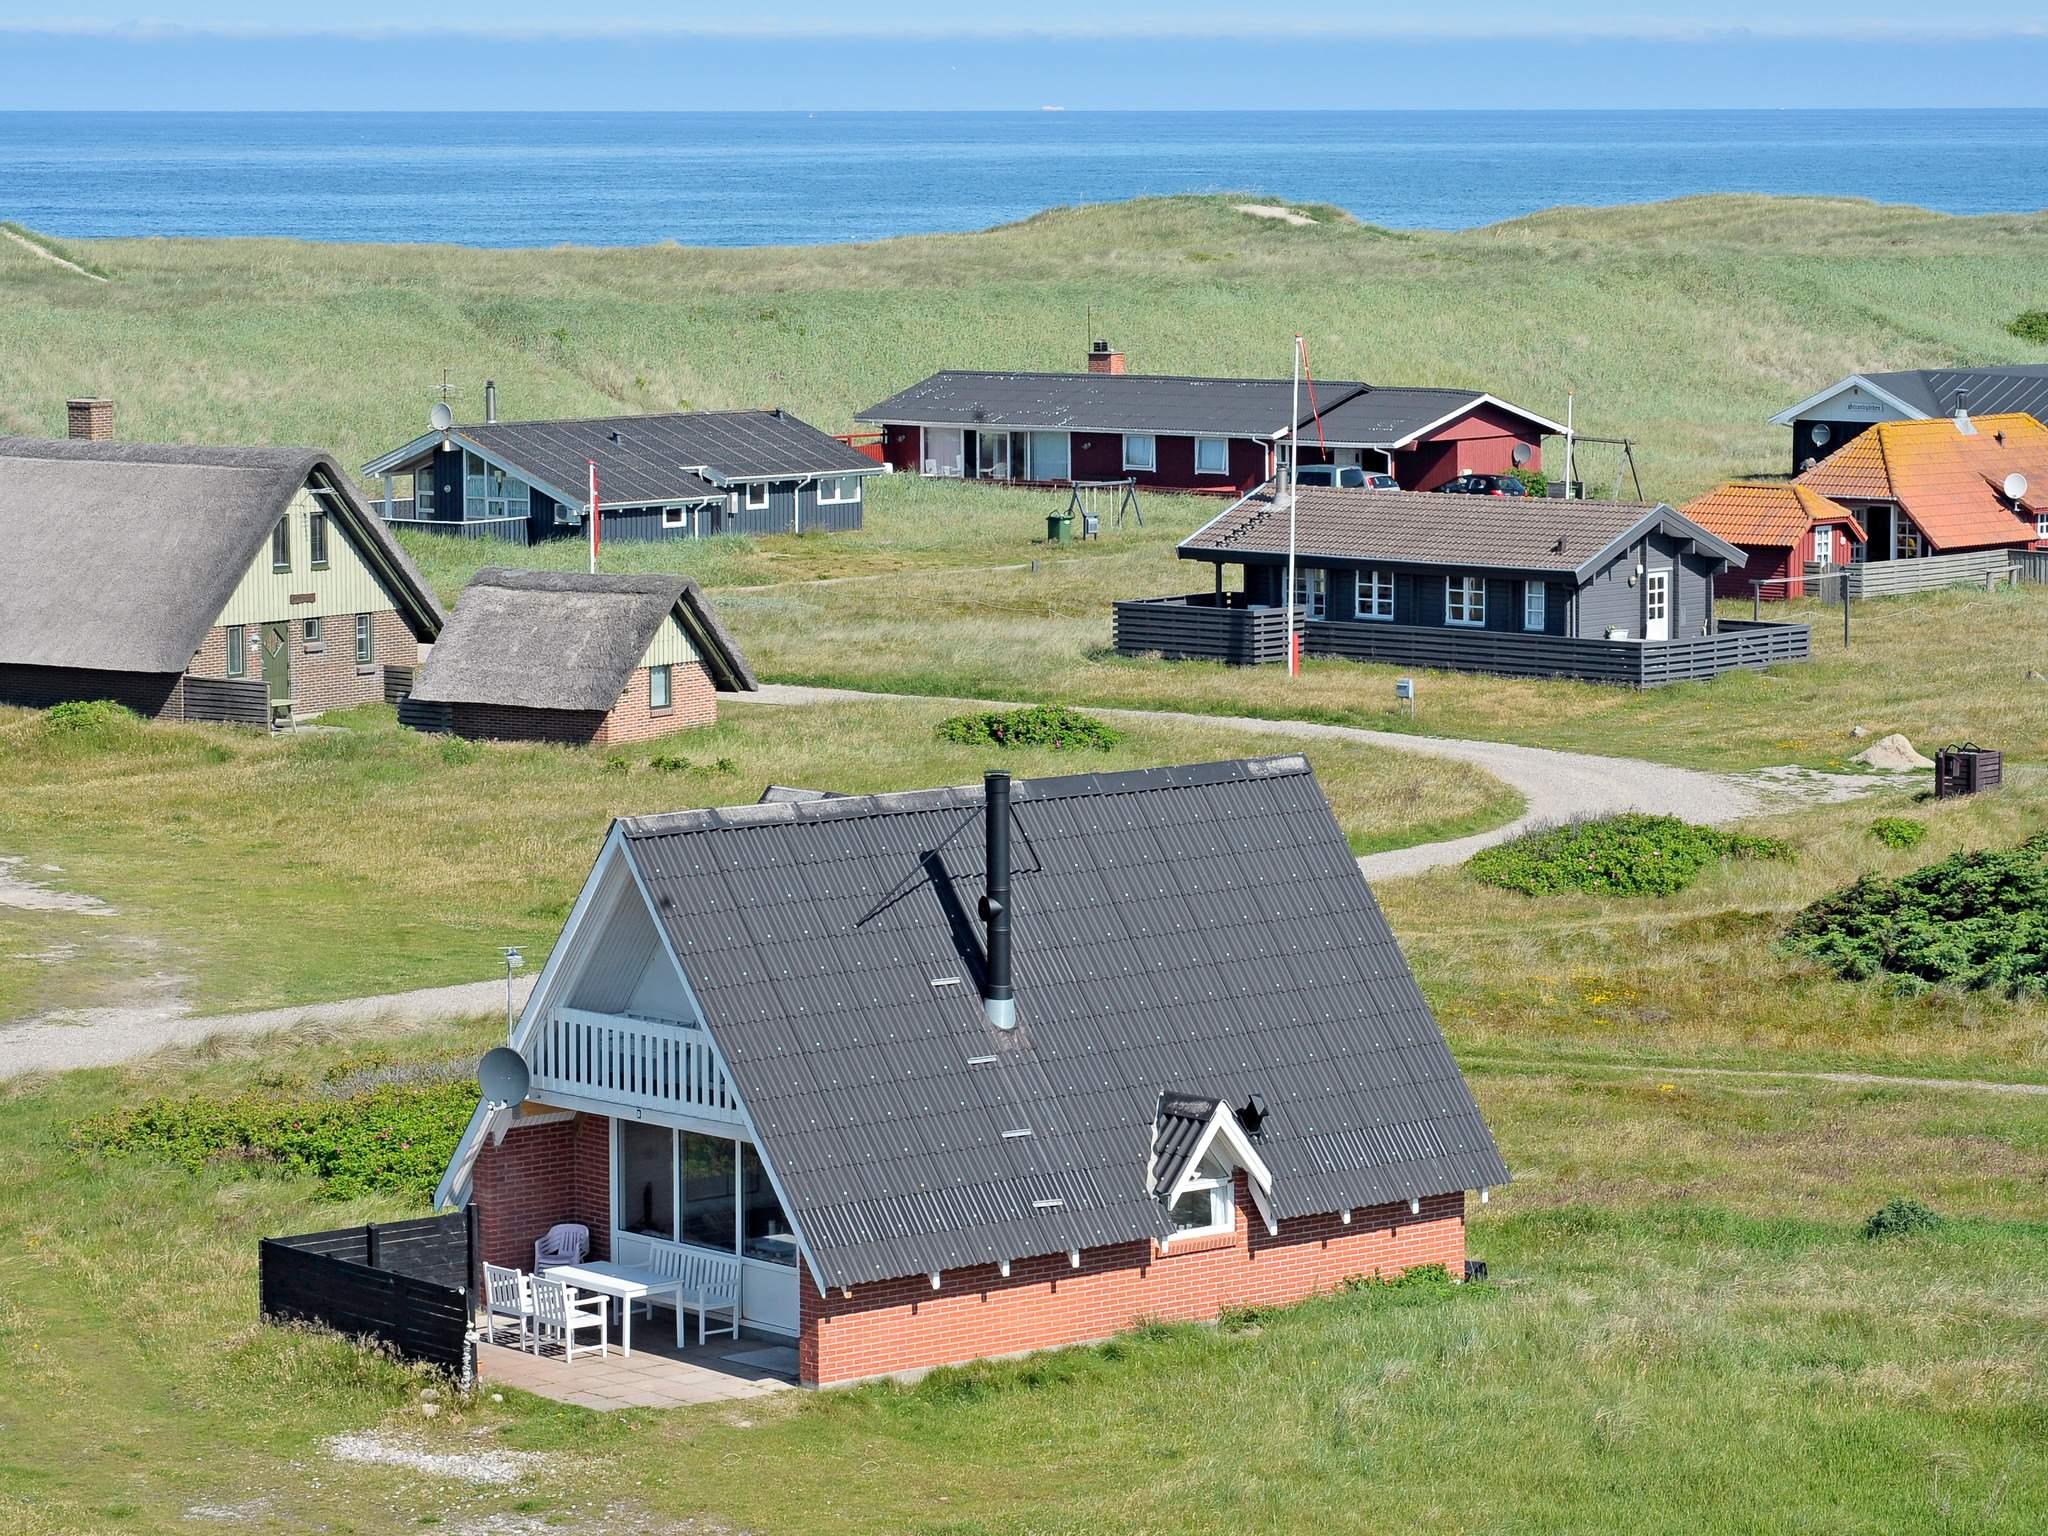 Ferienhaus Vrist (88948), Vrist, , Limfjord, Dänemark, Bild 1